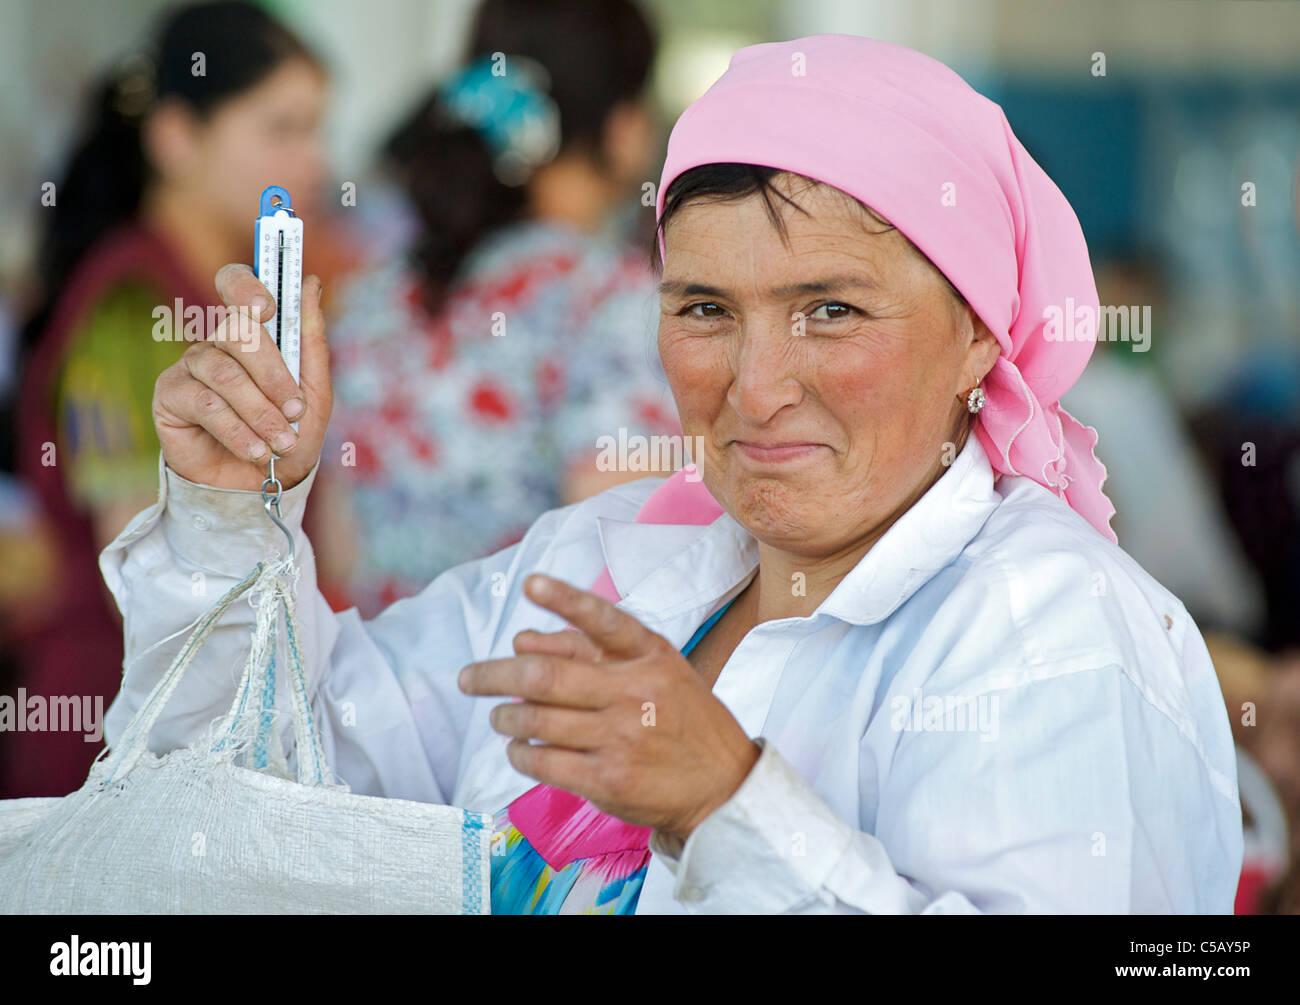 Uzbeki vegetable vendor, Samarkand market, Uzbekistan - Stock Image